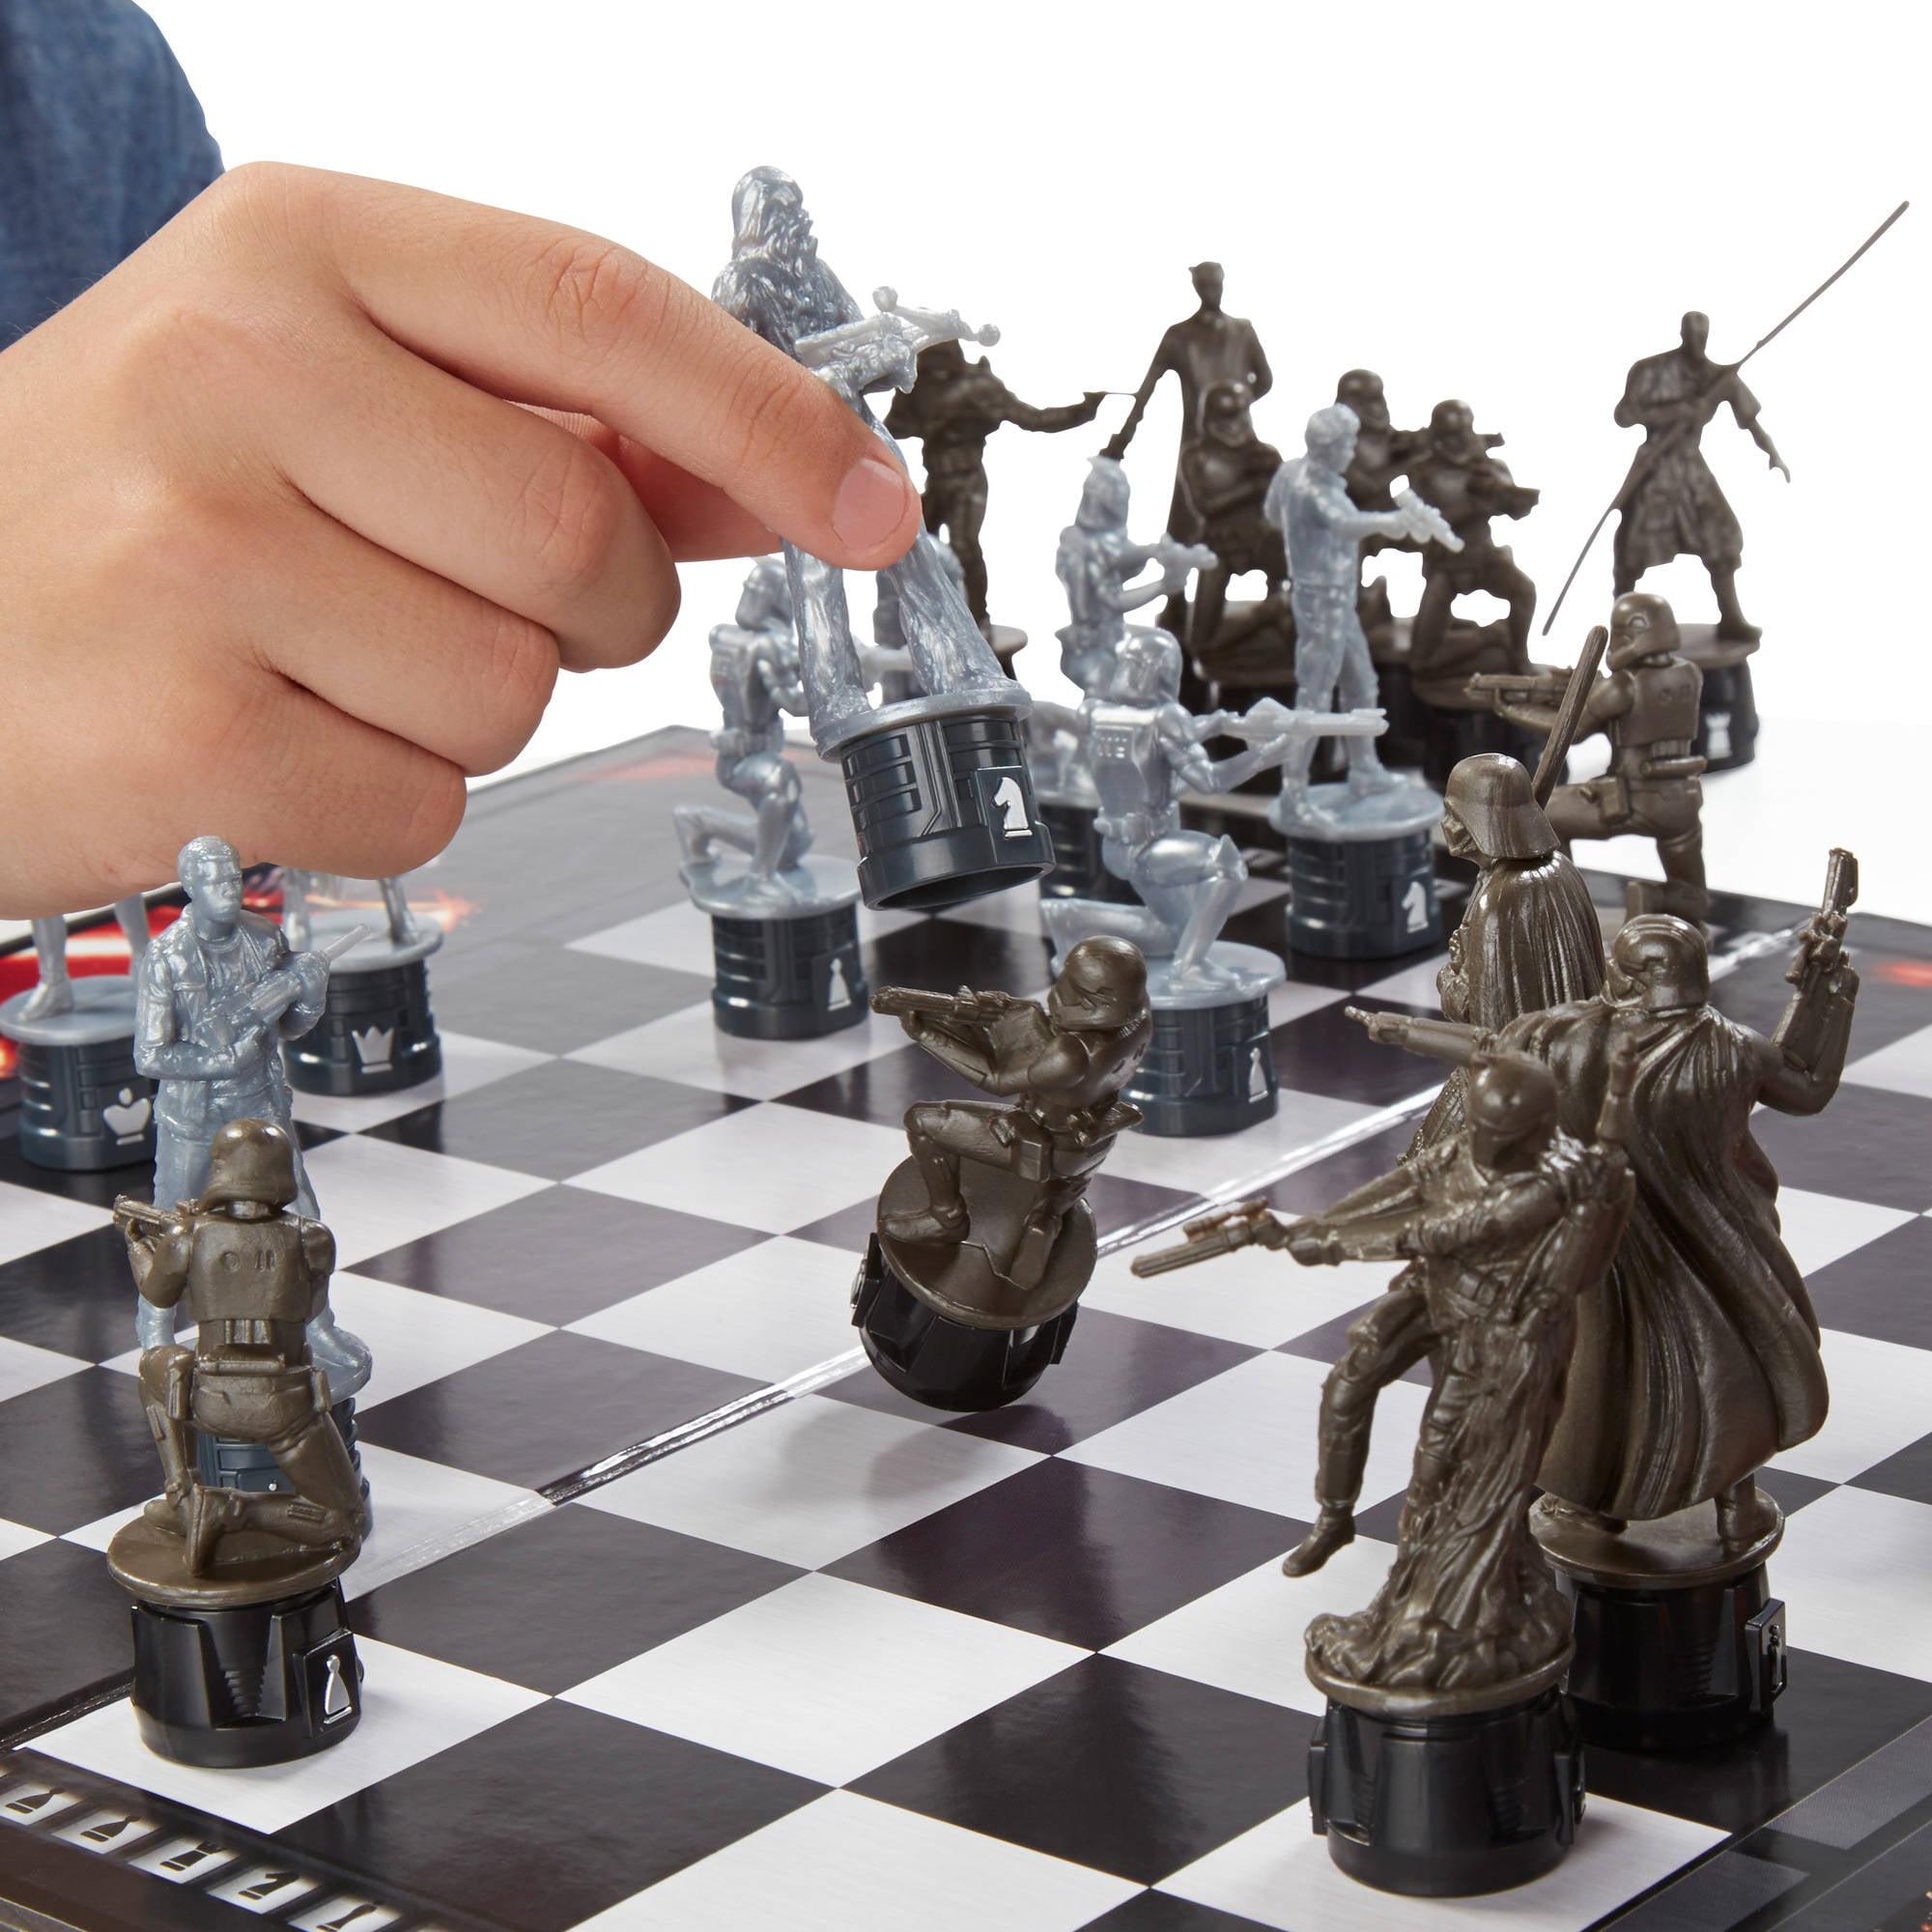 100 Video Games Glass Chess Board Daniela Raytchev